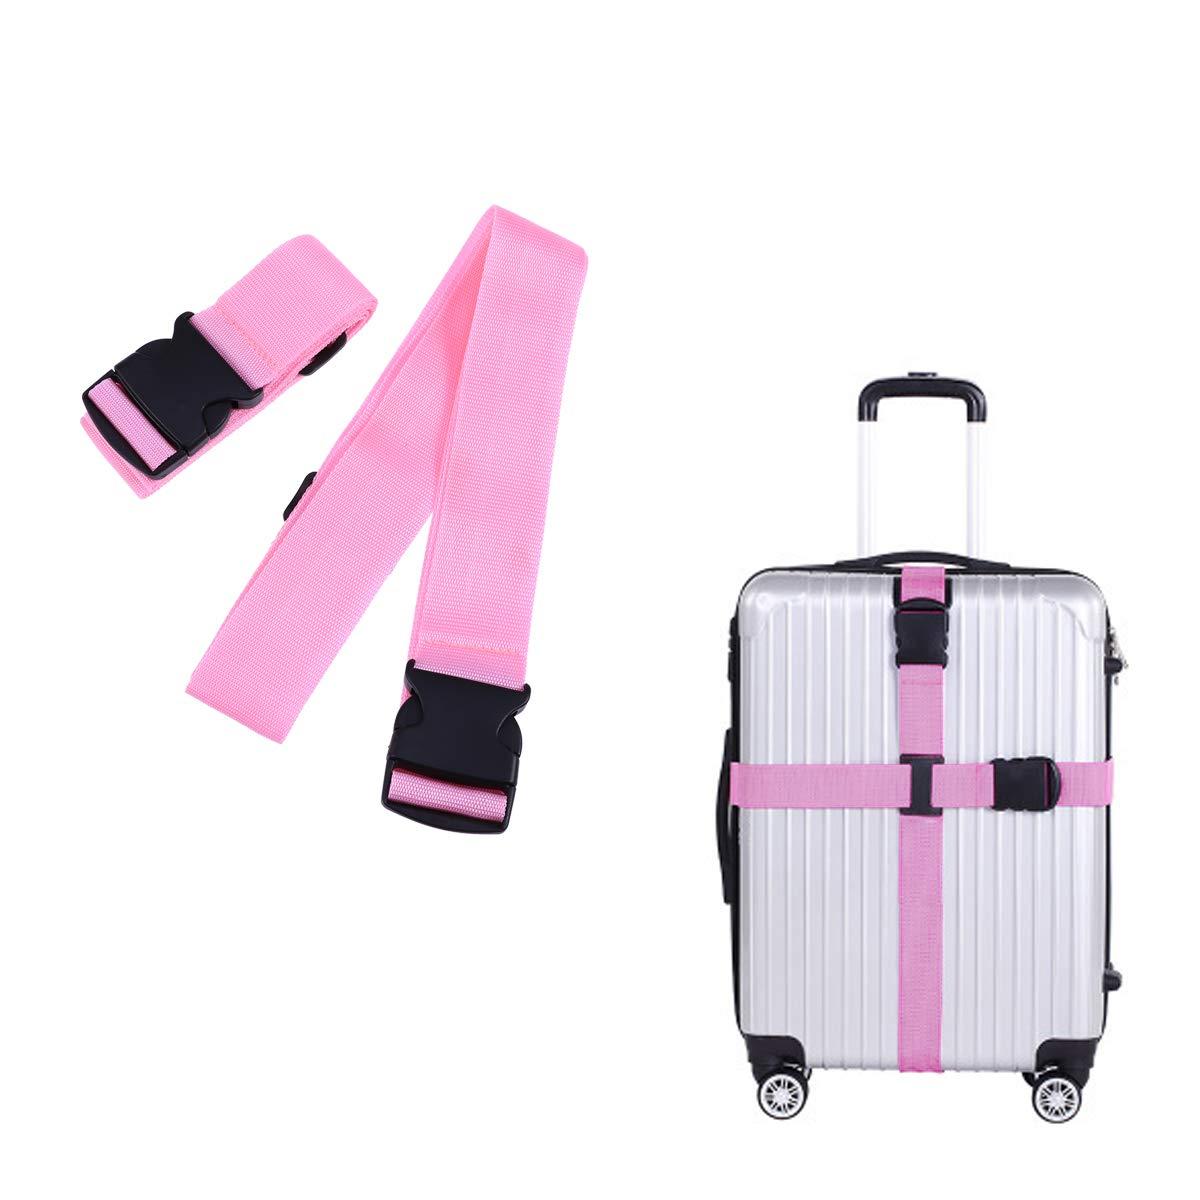 VORCOOL Travel Adjustable Luggage Strap Heavy Duty Suitcase Baggage Belt Release Buckle (Pink)